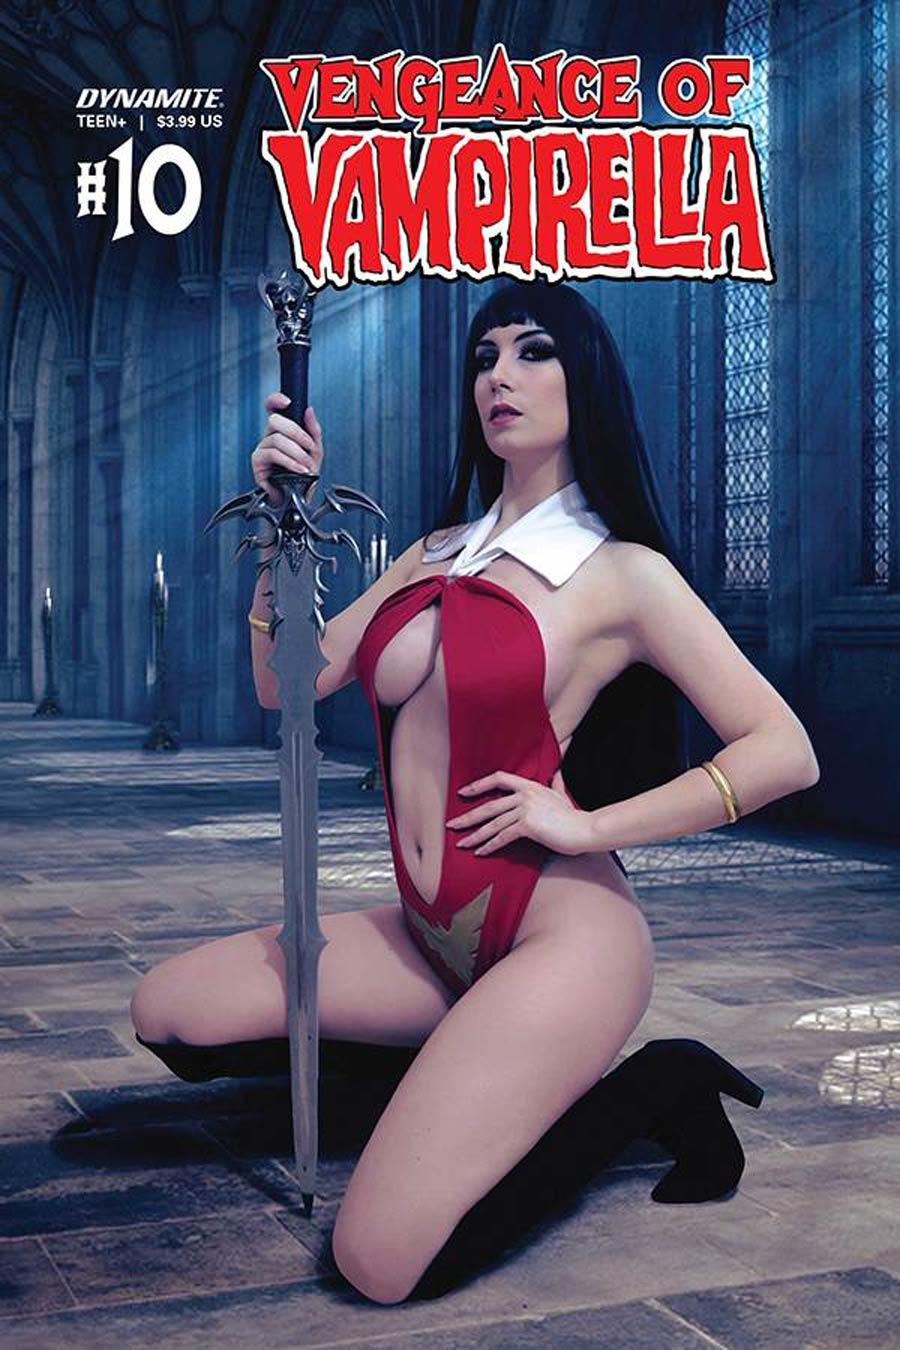 Vengeance Of Vampirella Vol 2 #10 Cover D Variant Giulietta Zawadzki Cosplay Photo Cover